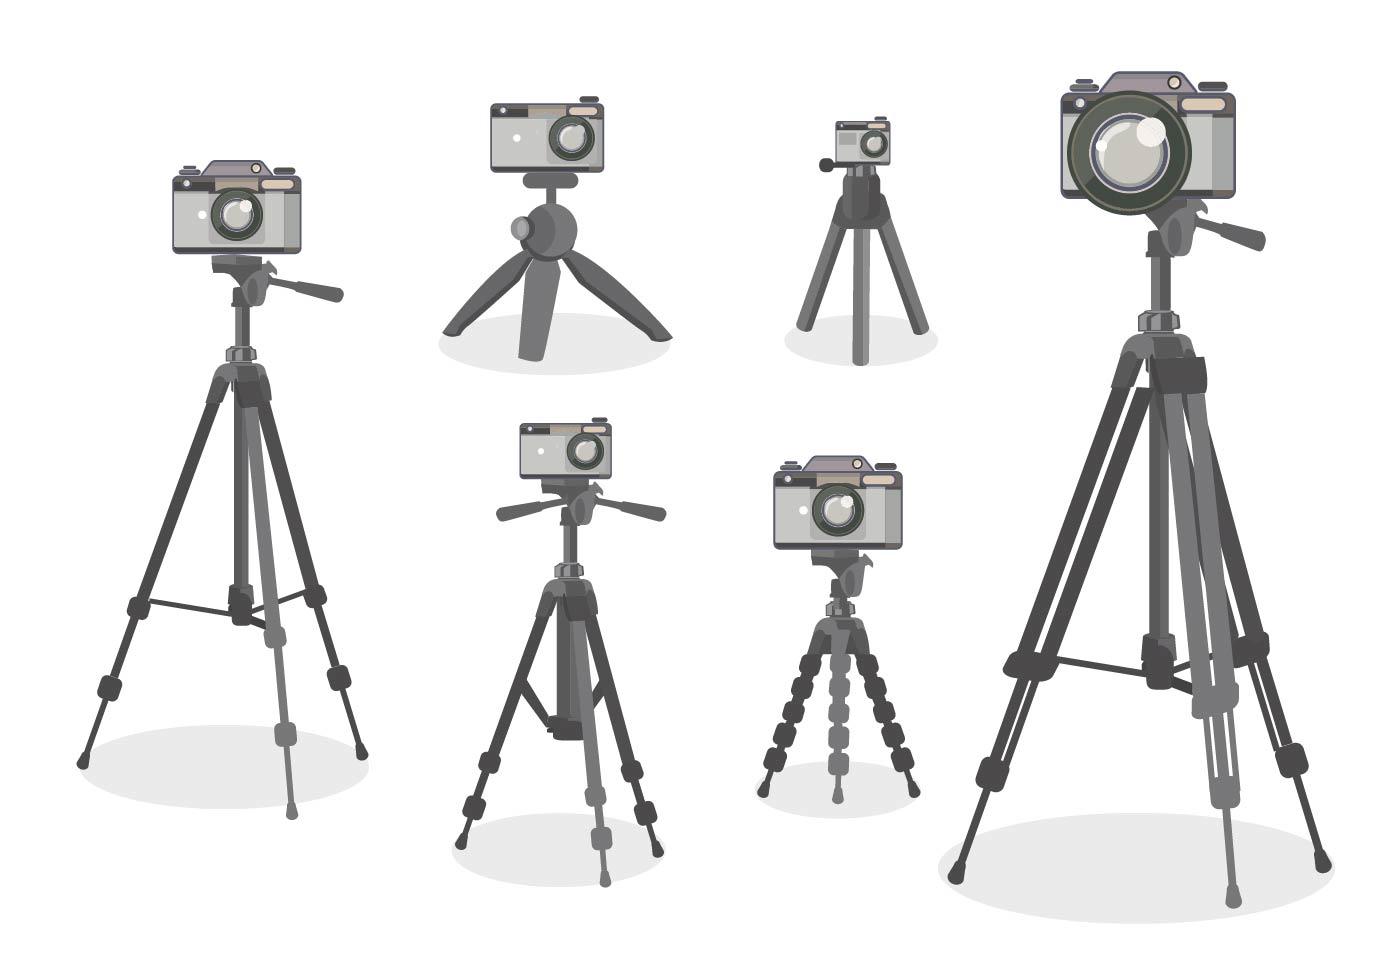 Camera Tripod Vector Flat Design style - Download Free ... (1400 x 980 Pixel)